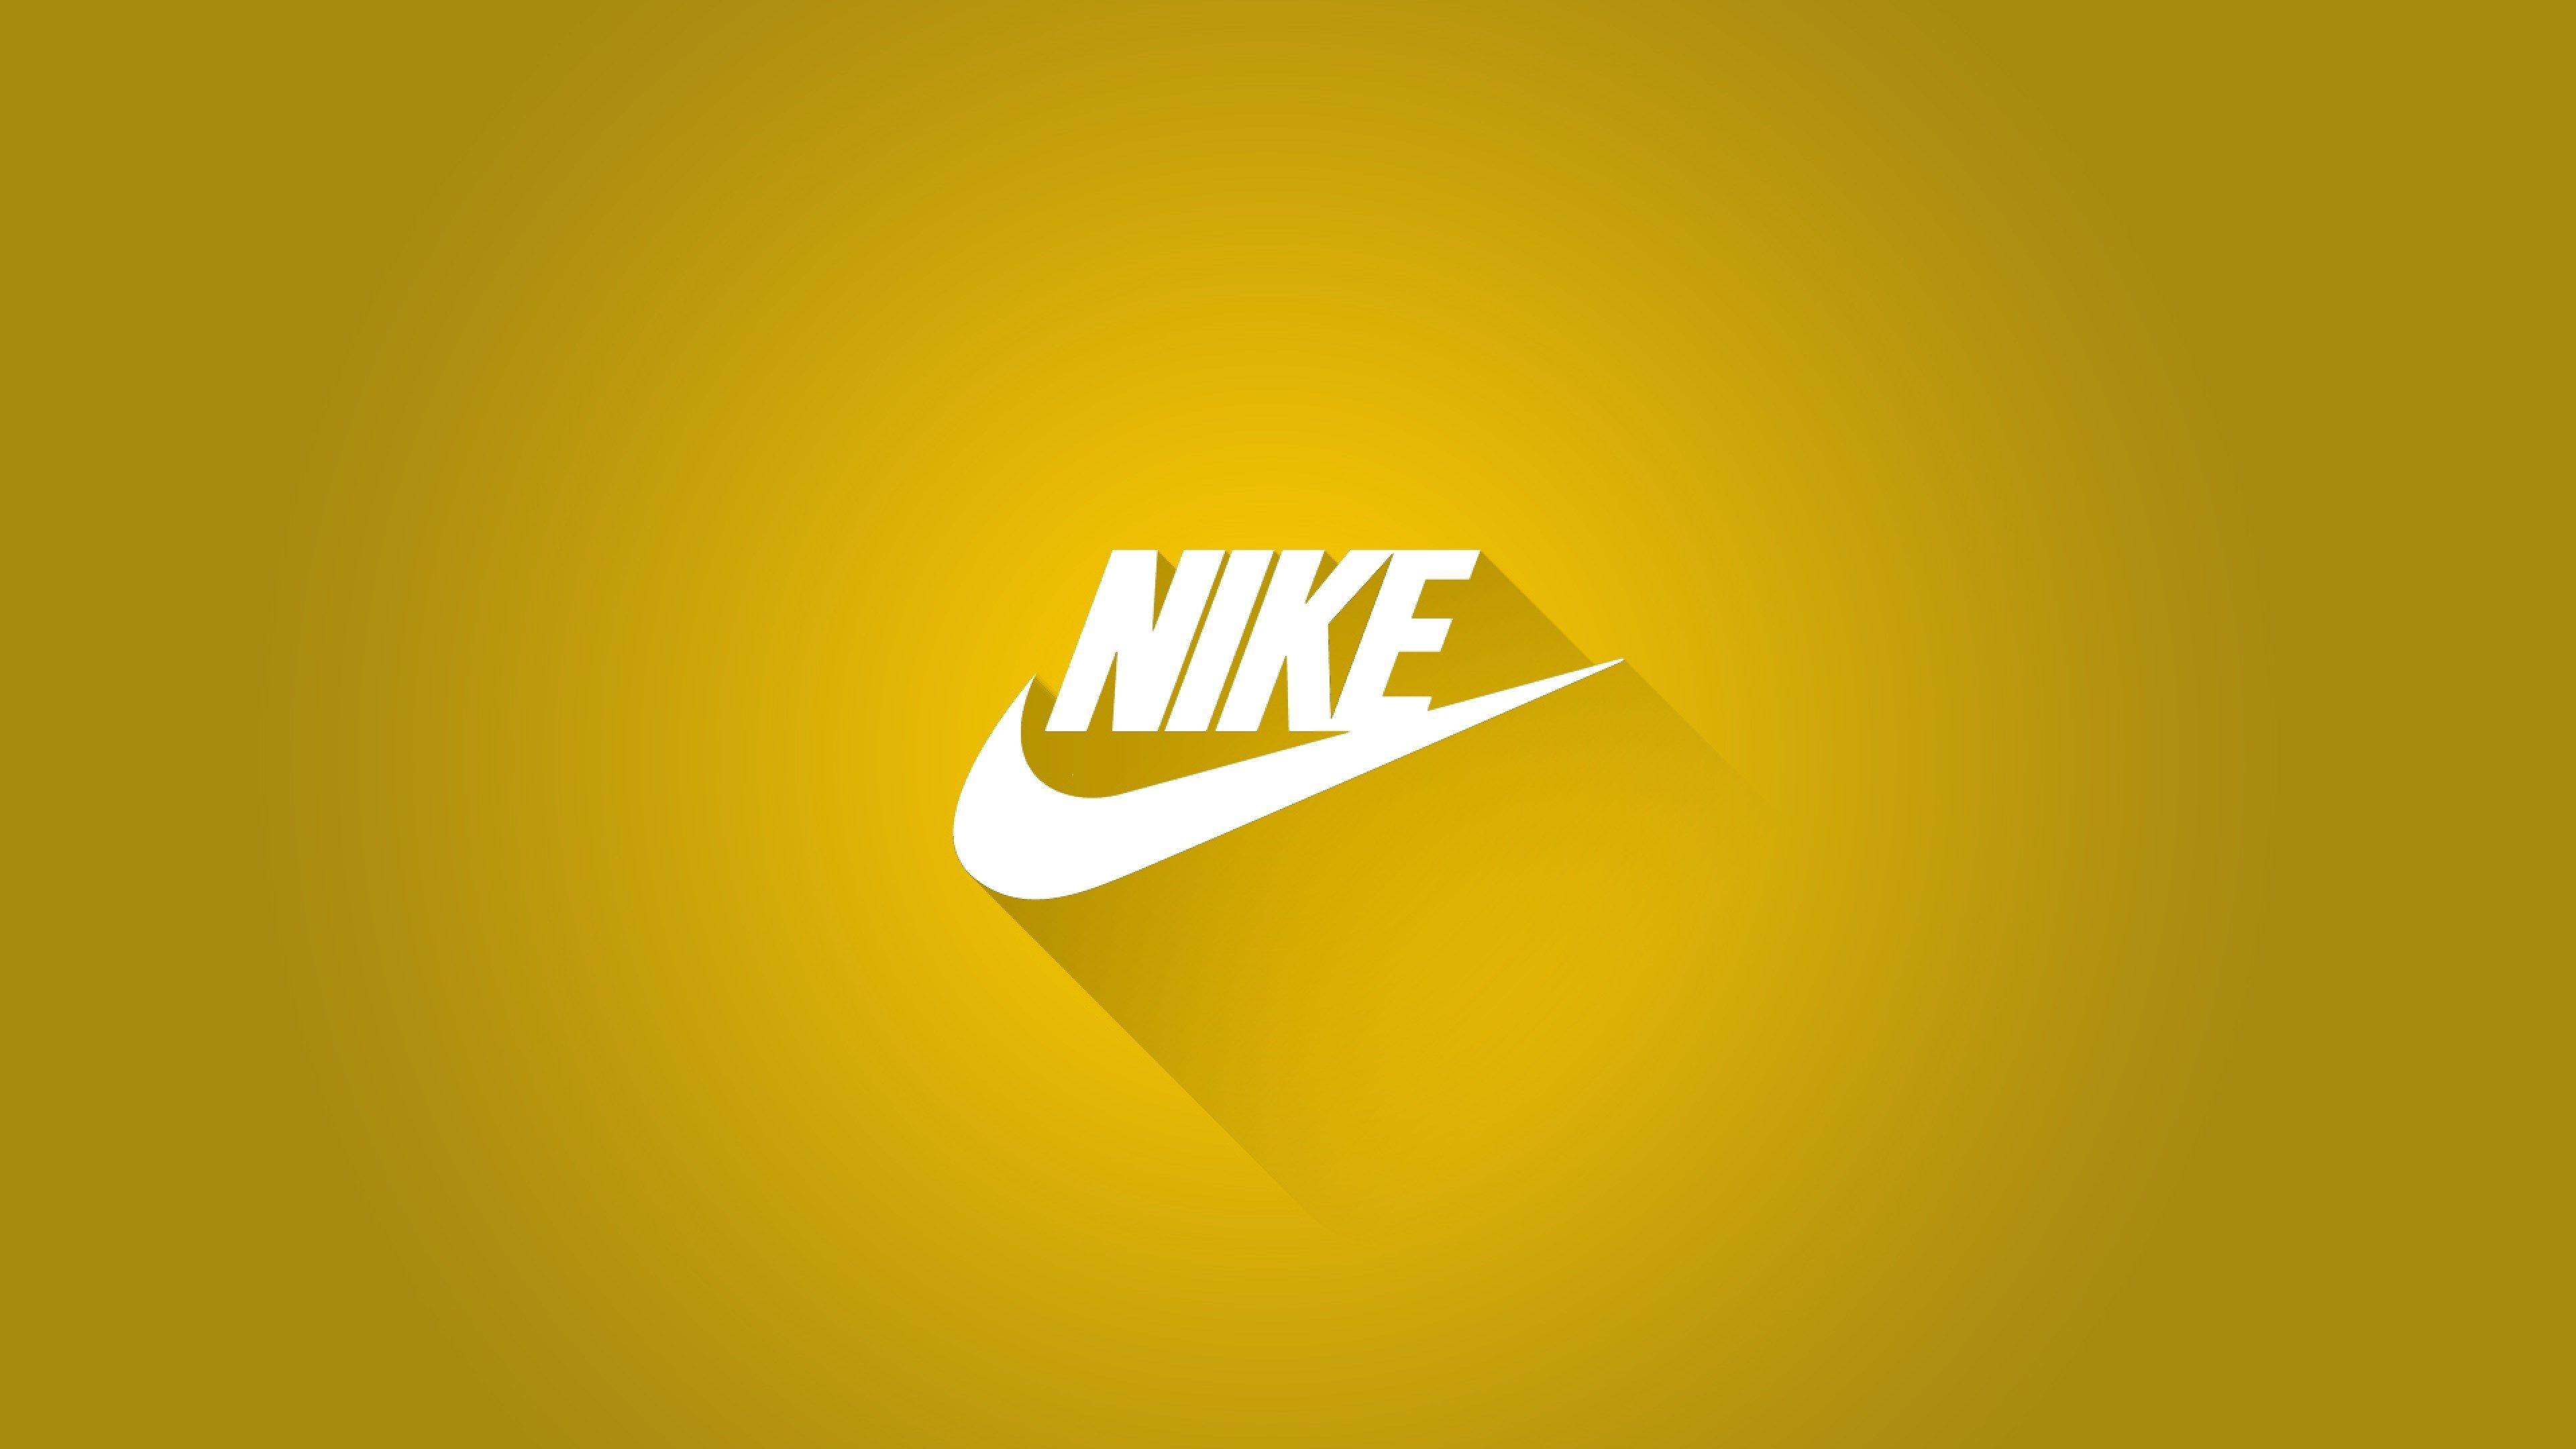 4K Nike Wallpapers   Top 4K Nike Backgrounds   WallpaperAccess 3840x2160